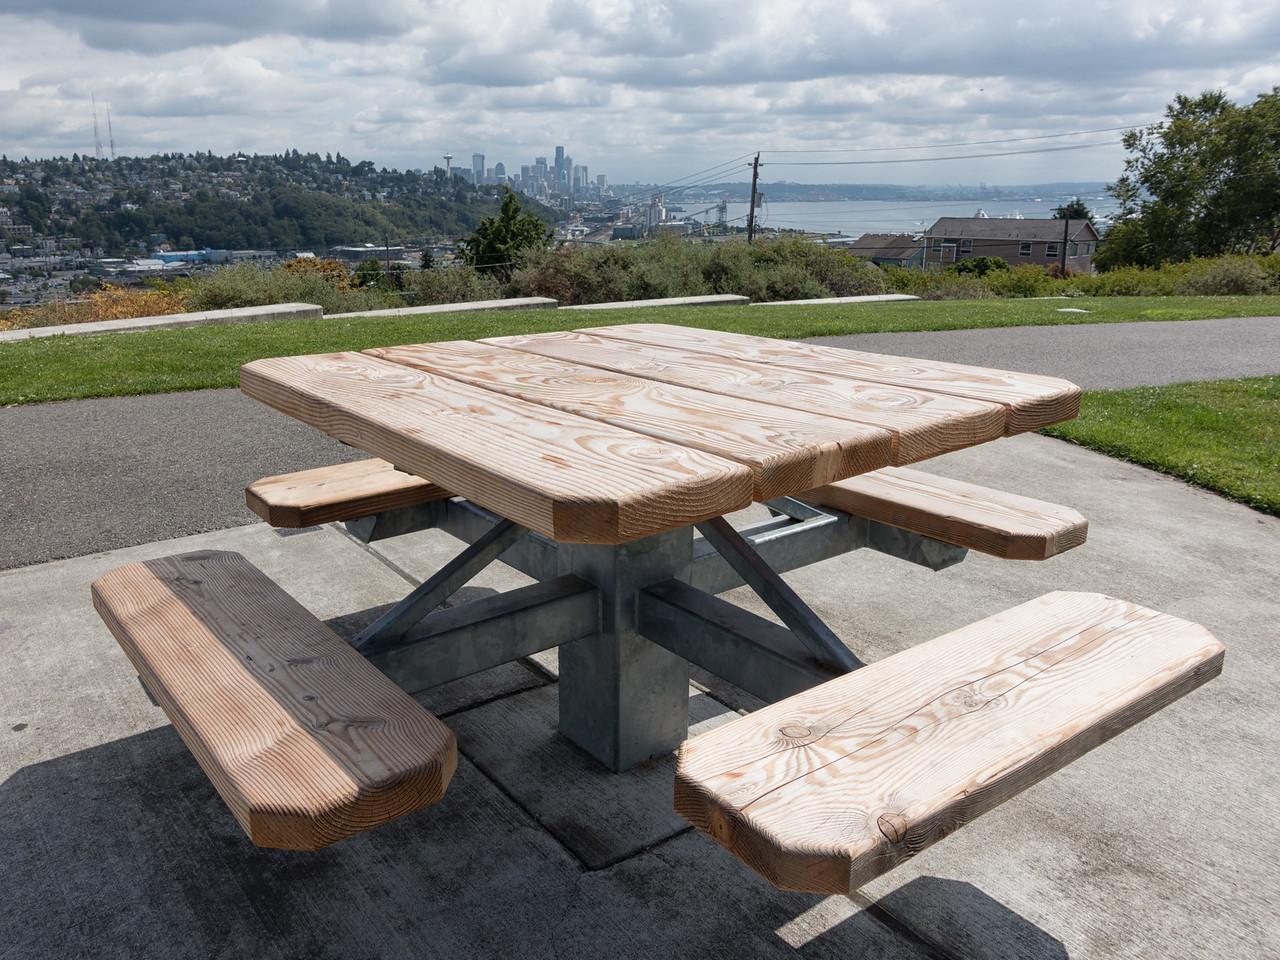 20140821.  Ella Bailey Park, Seattle WA.